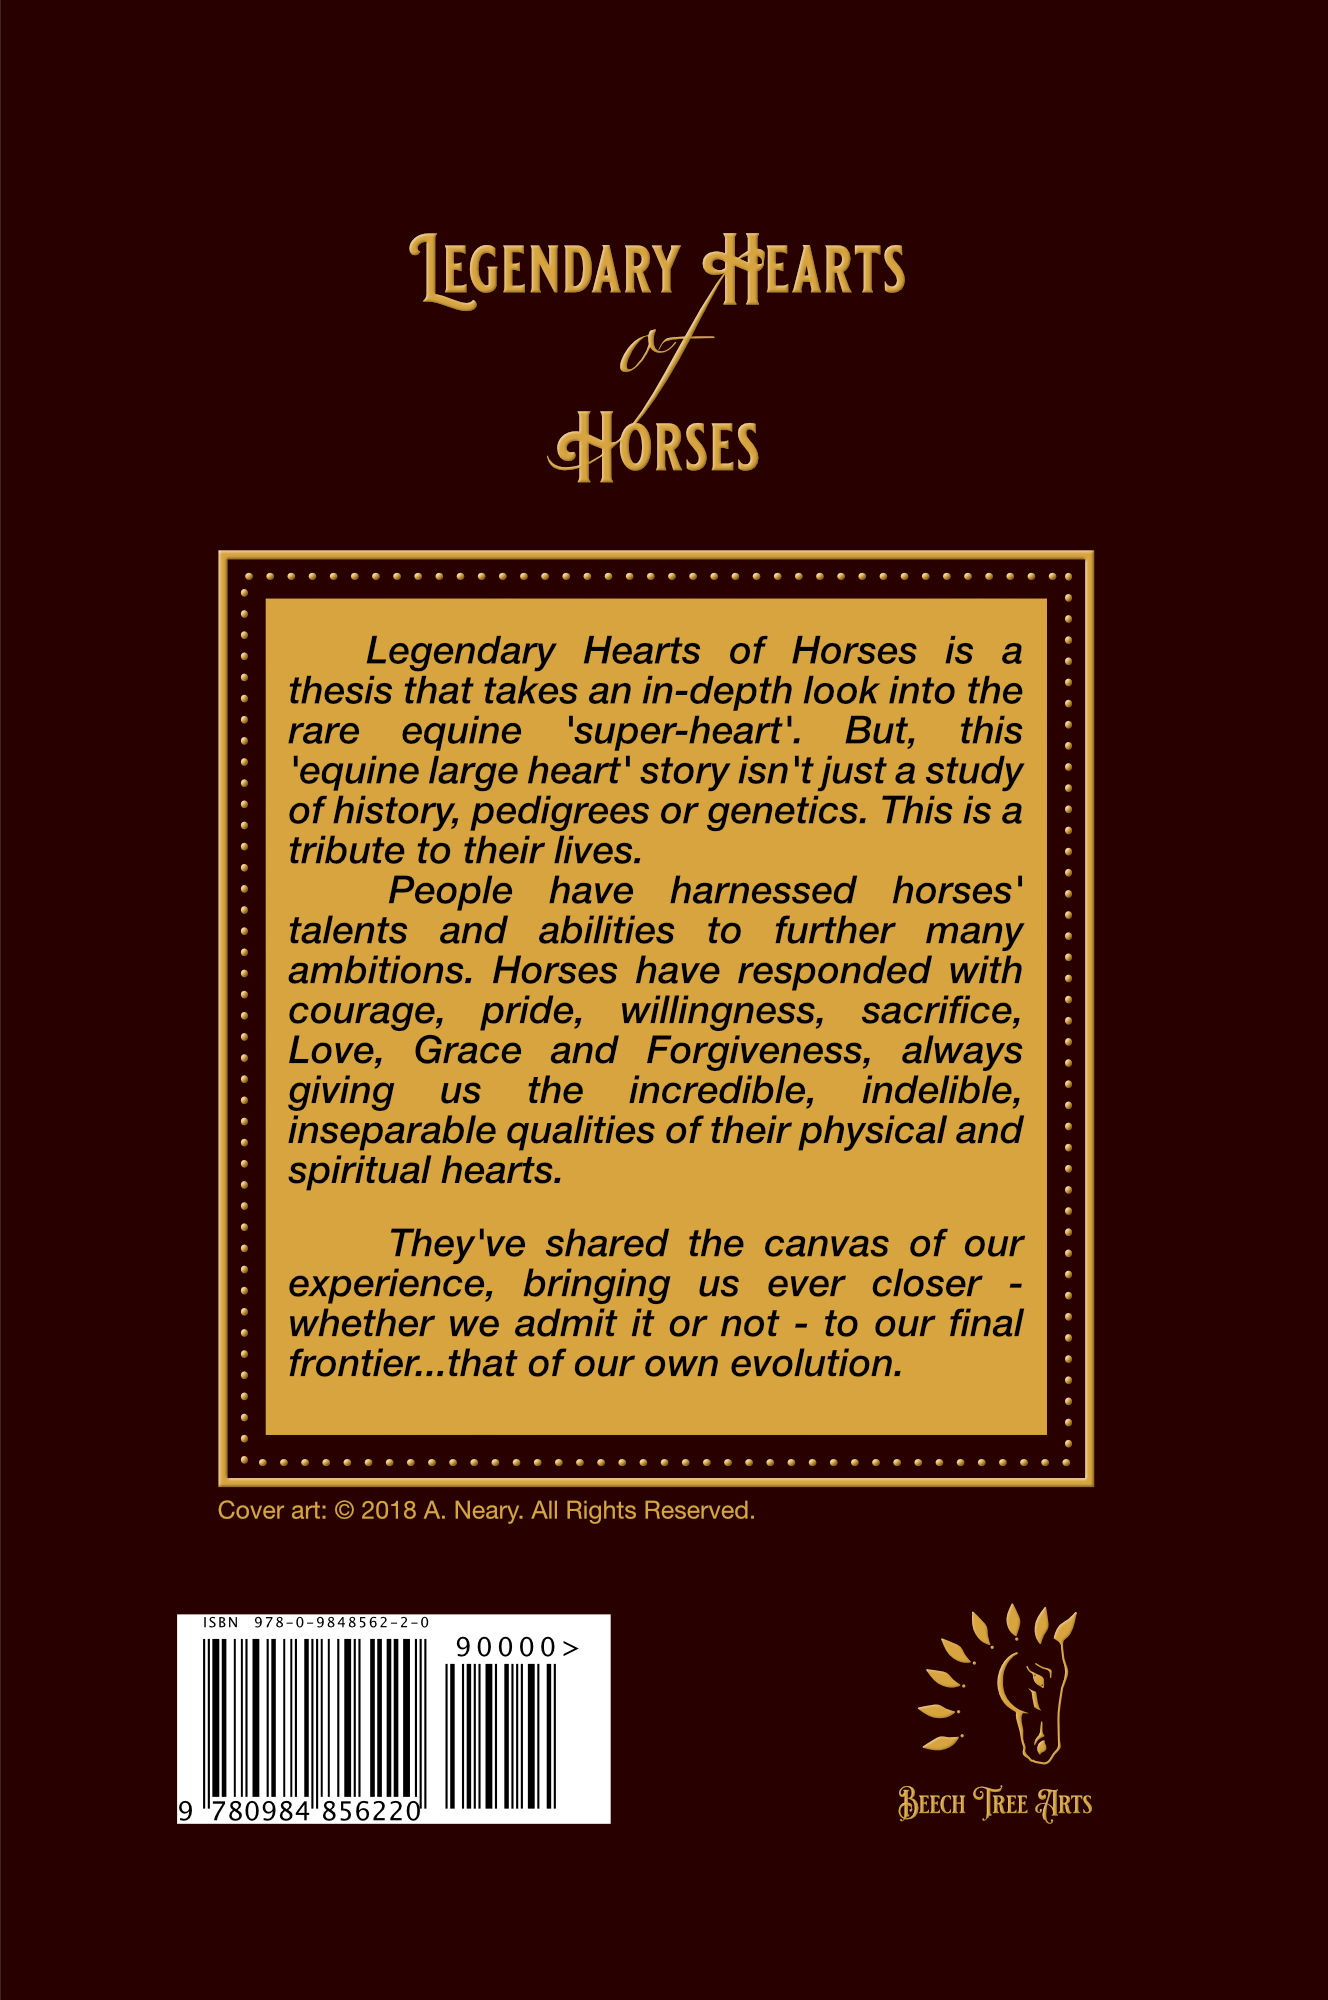 Legendary Hearts of Horses back cover